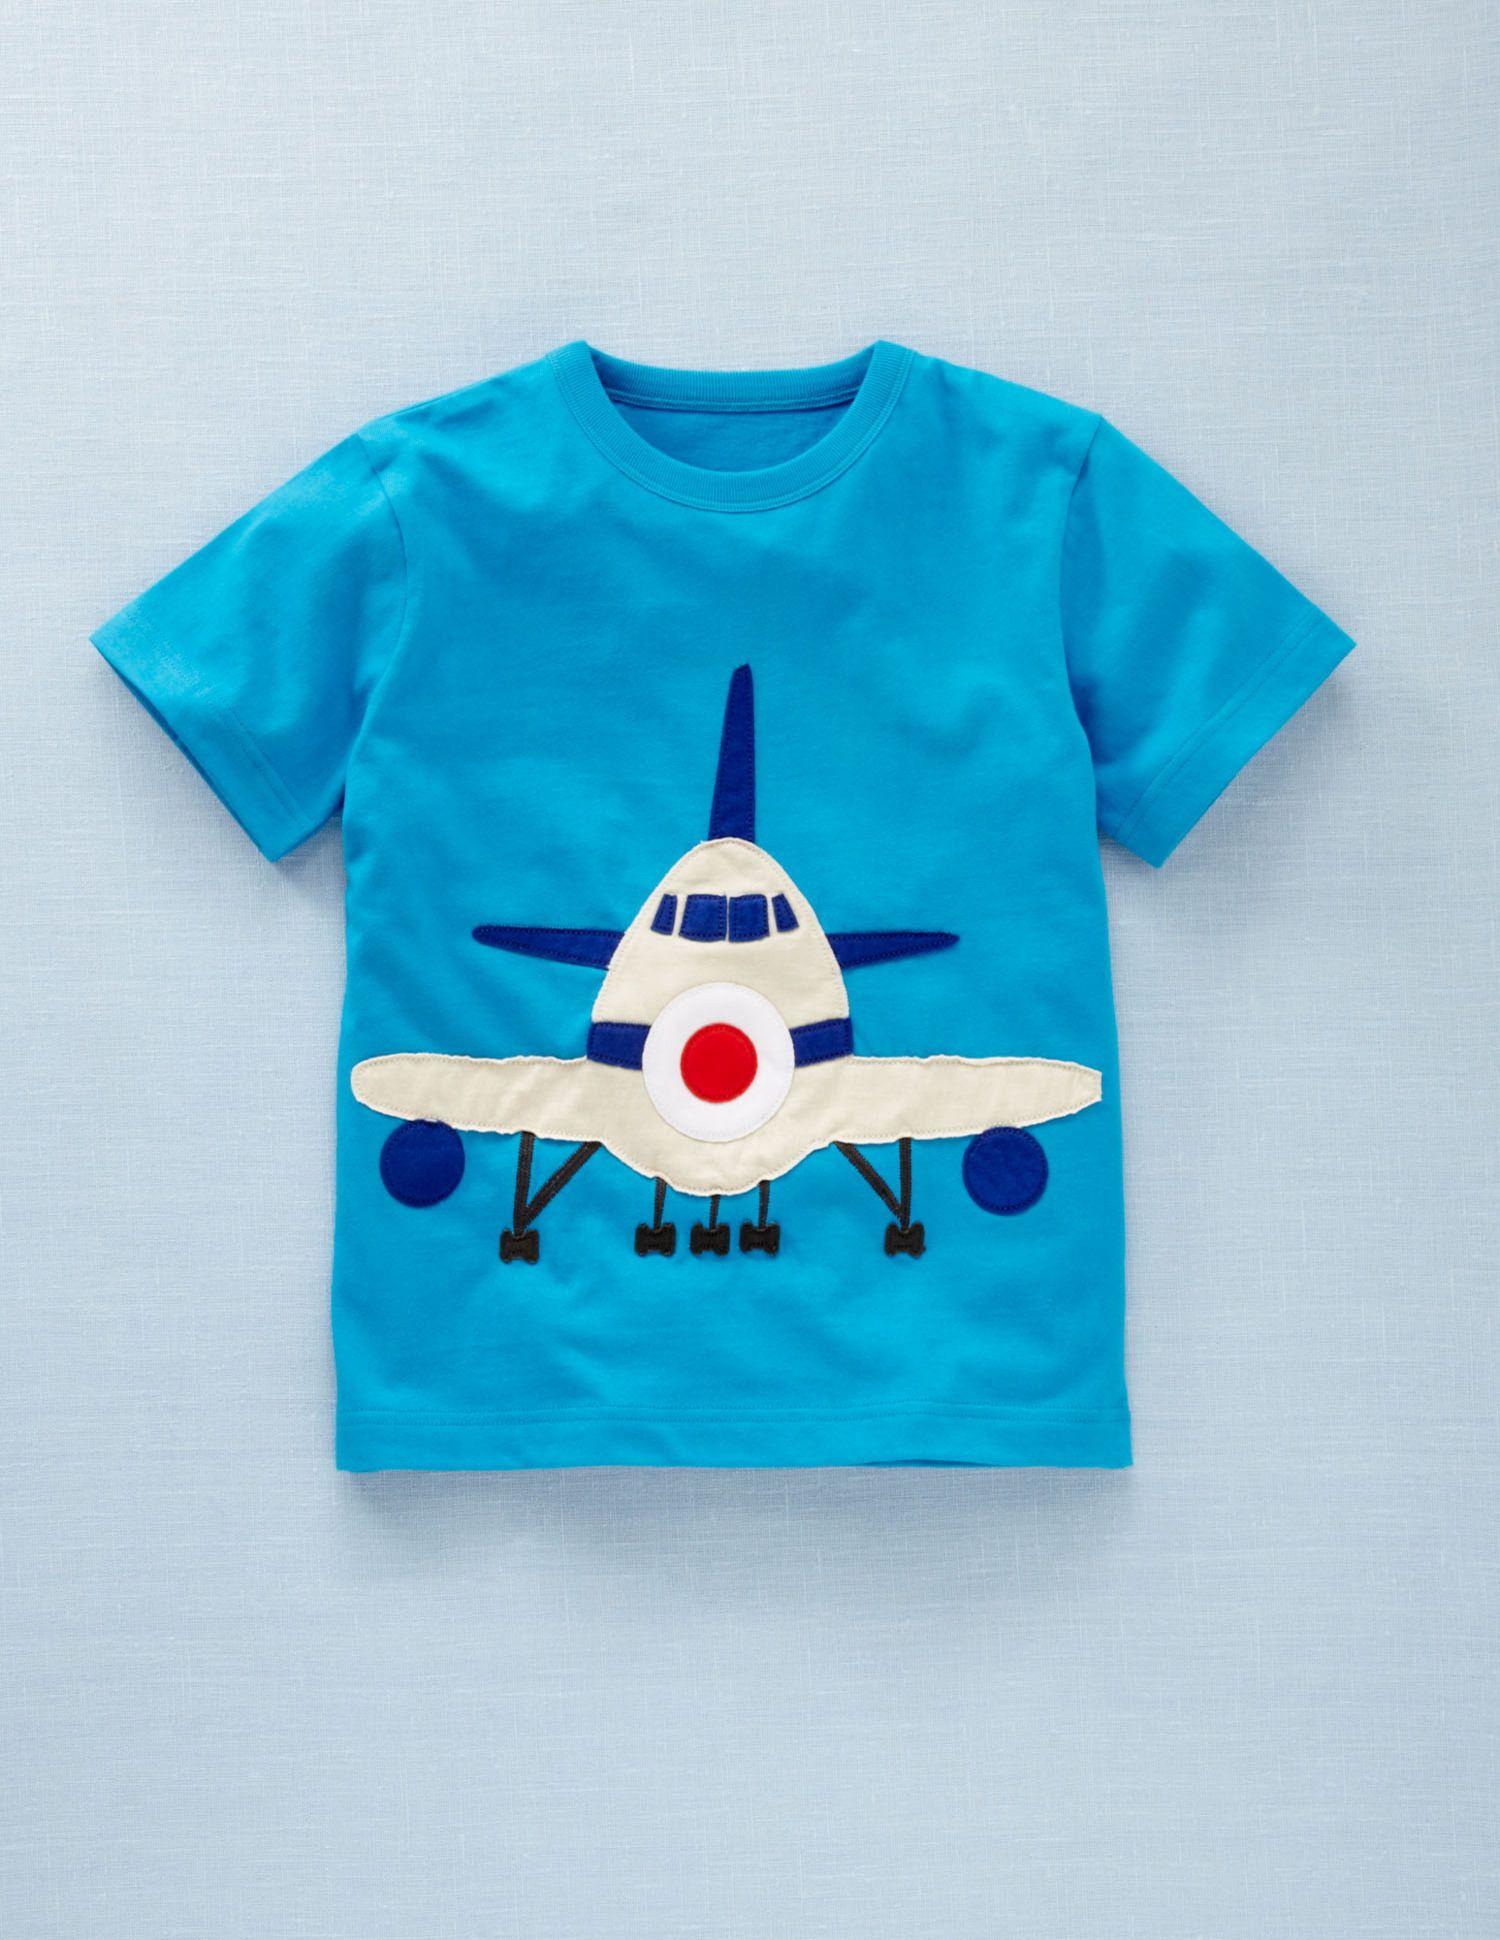 Mini Boden - T-Shirt mit Fahrzeugapplikation | Applizieren ...